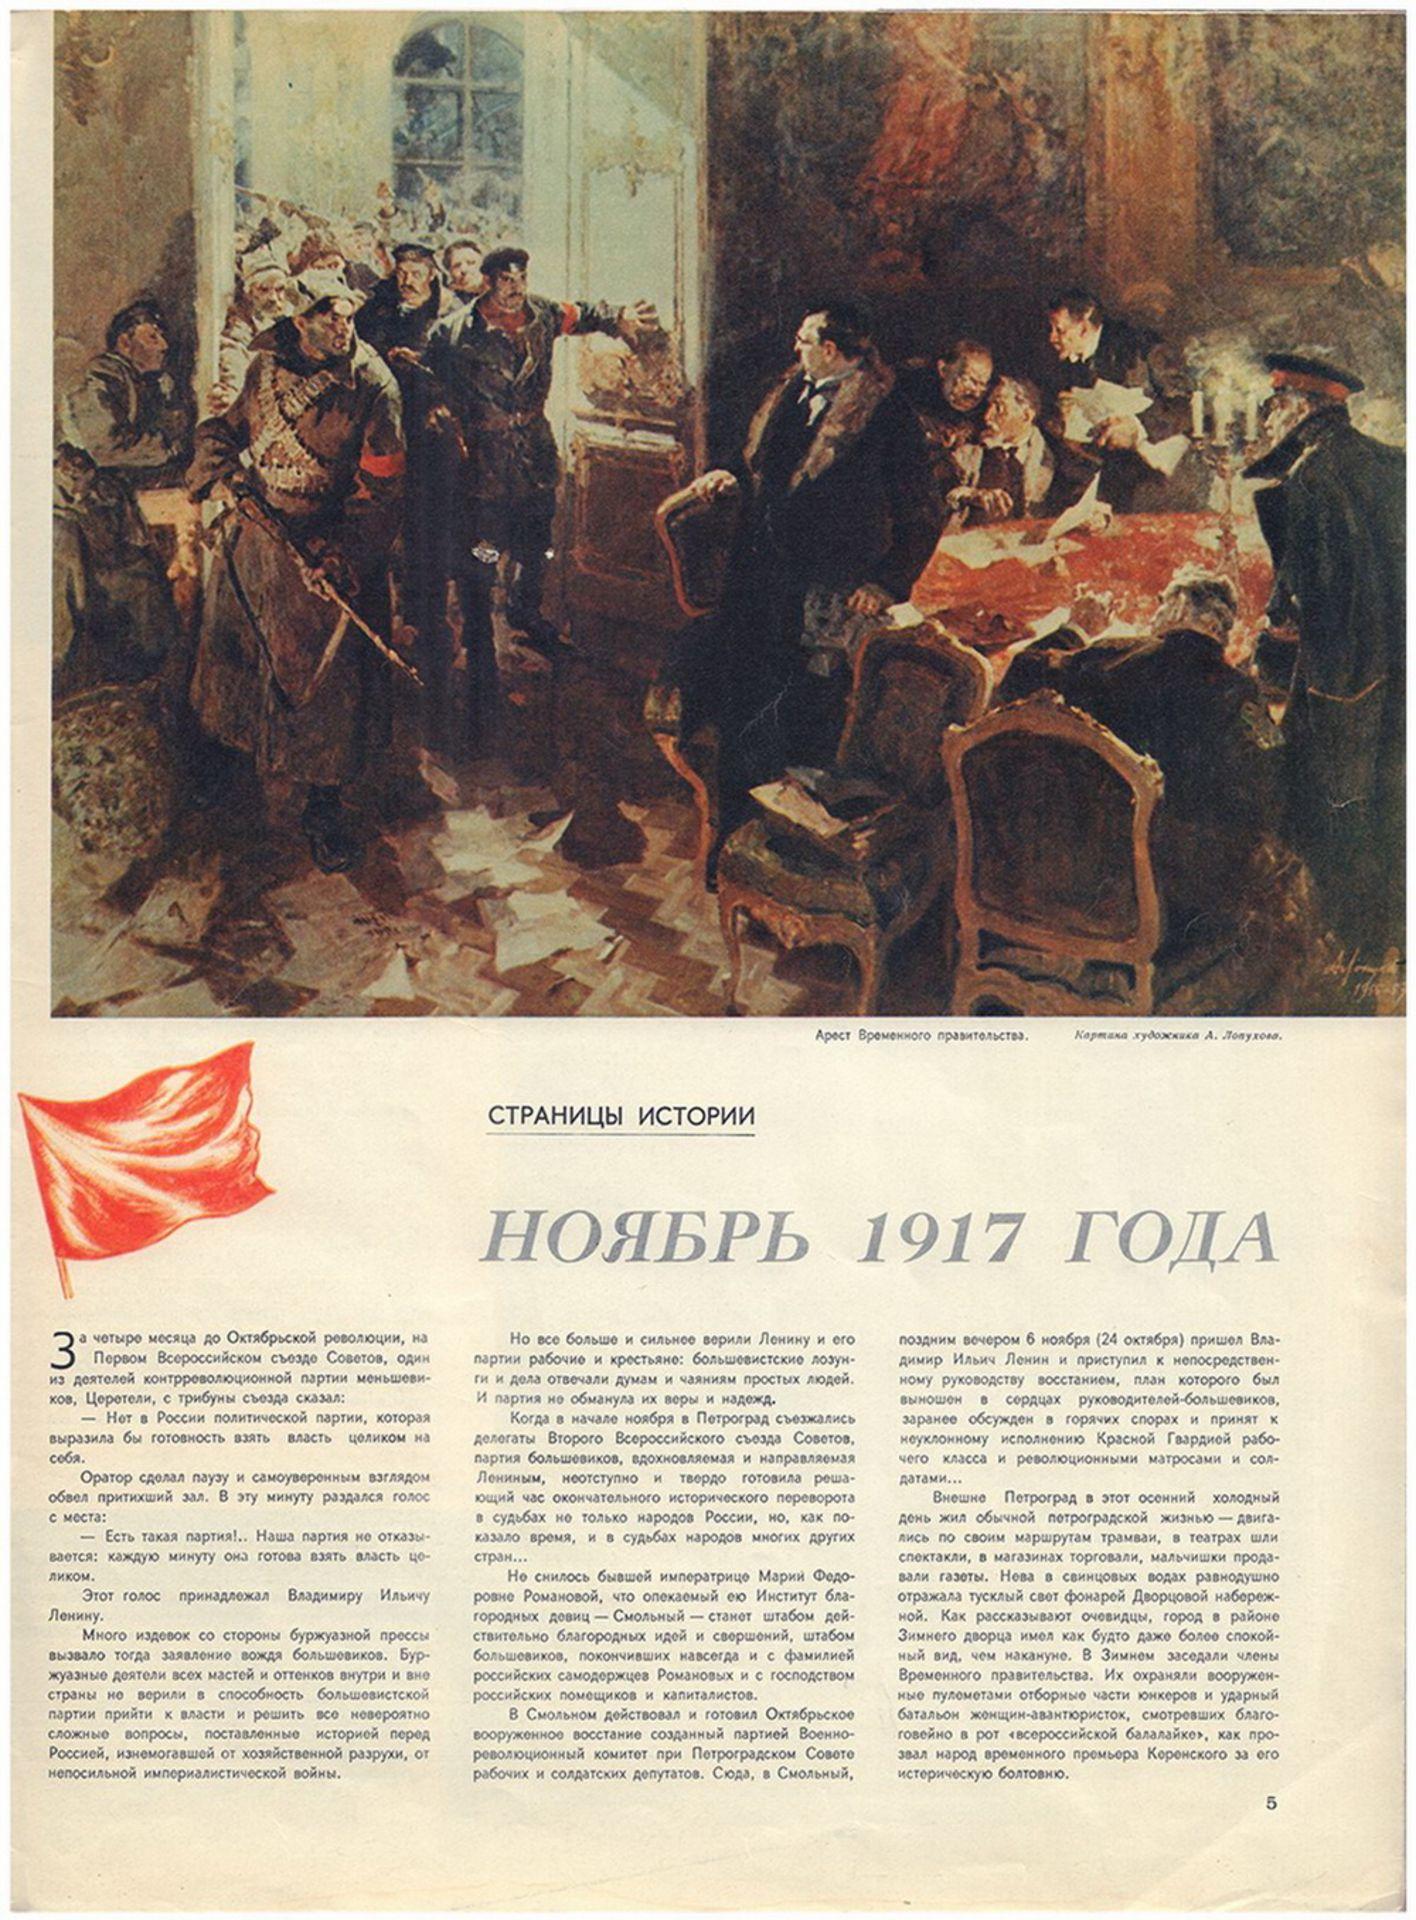 """Soviet Union"": Magazine. 11th (93) Anniversary Issue. Moscow, 1957. 40 pp.: ill.; 40x30 cm. <br>Ori - Bild 3 aus 5"